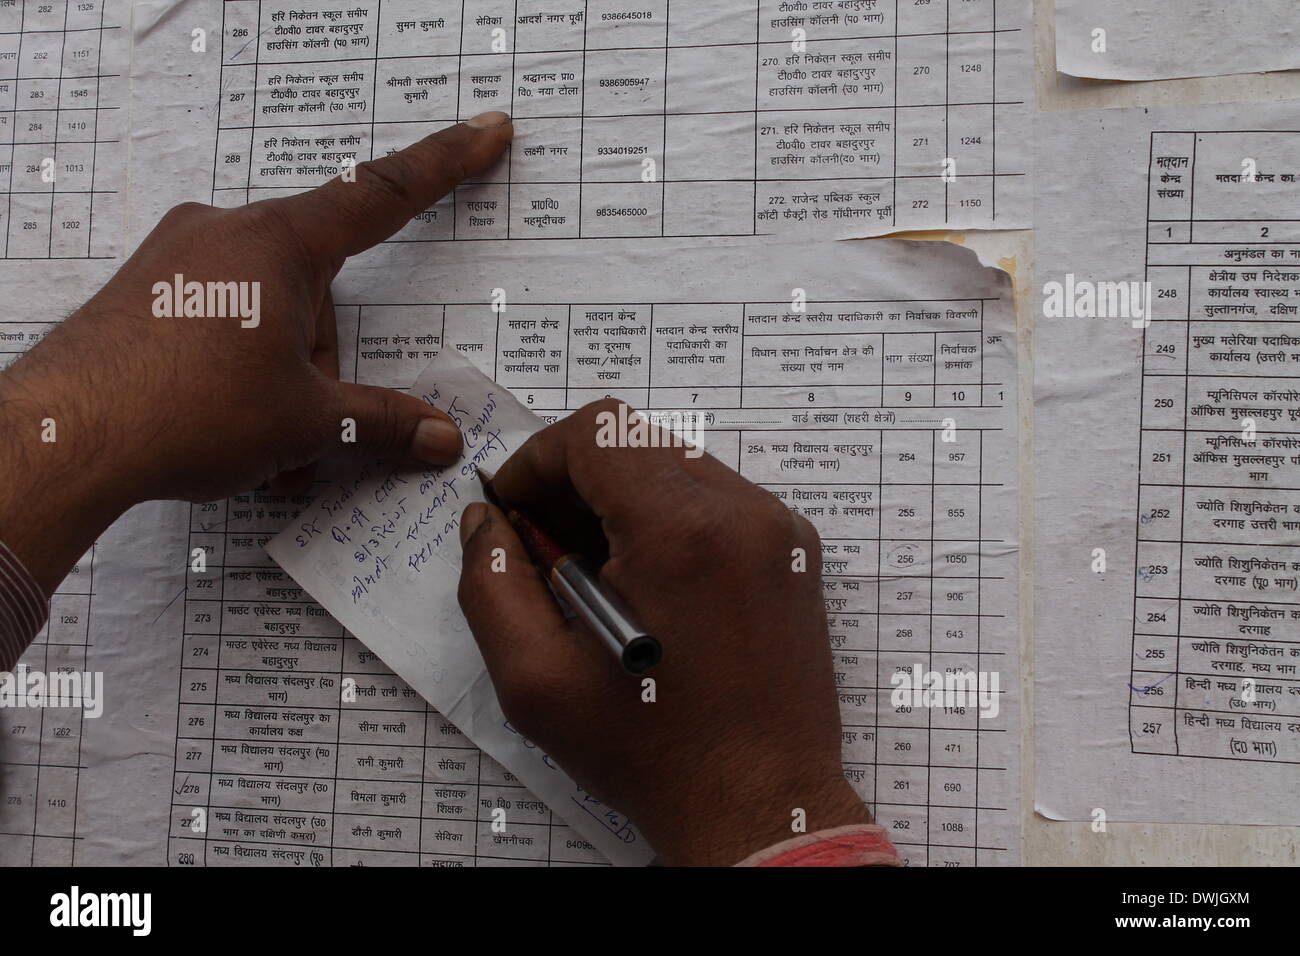 Bankipore Ghat, Patna, Bihar, India, 10th March 2014  Monday Stock